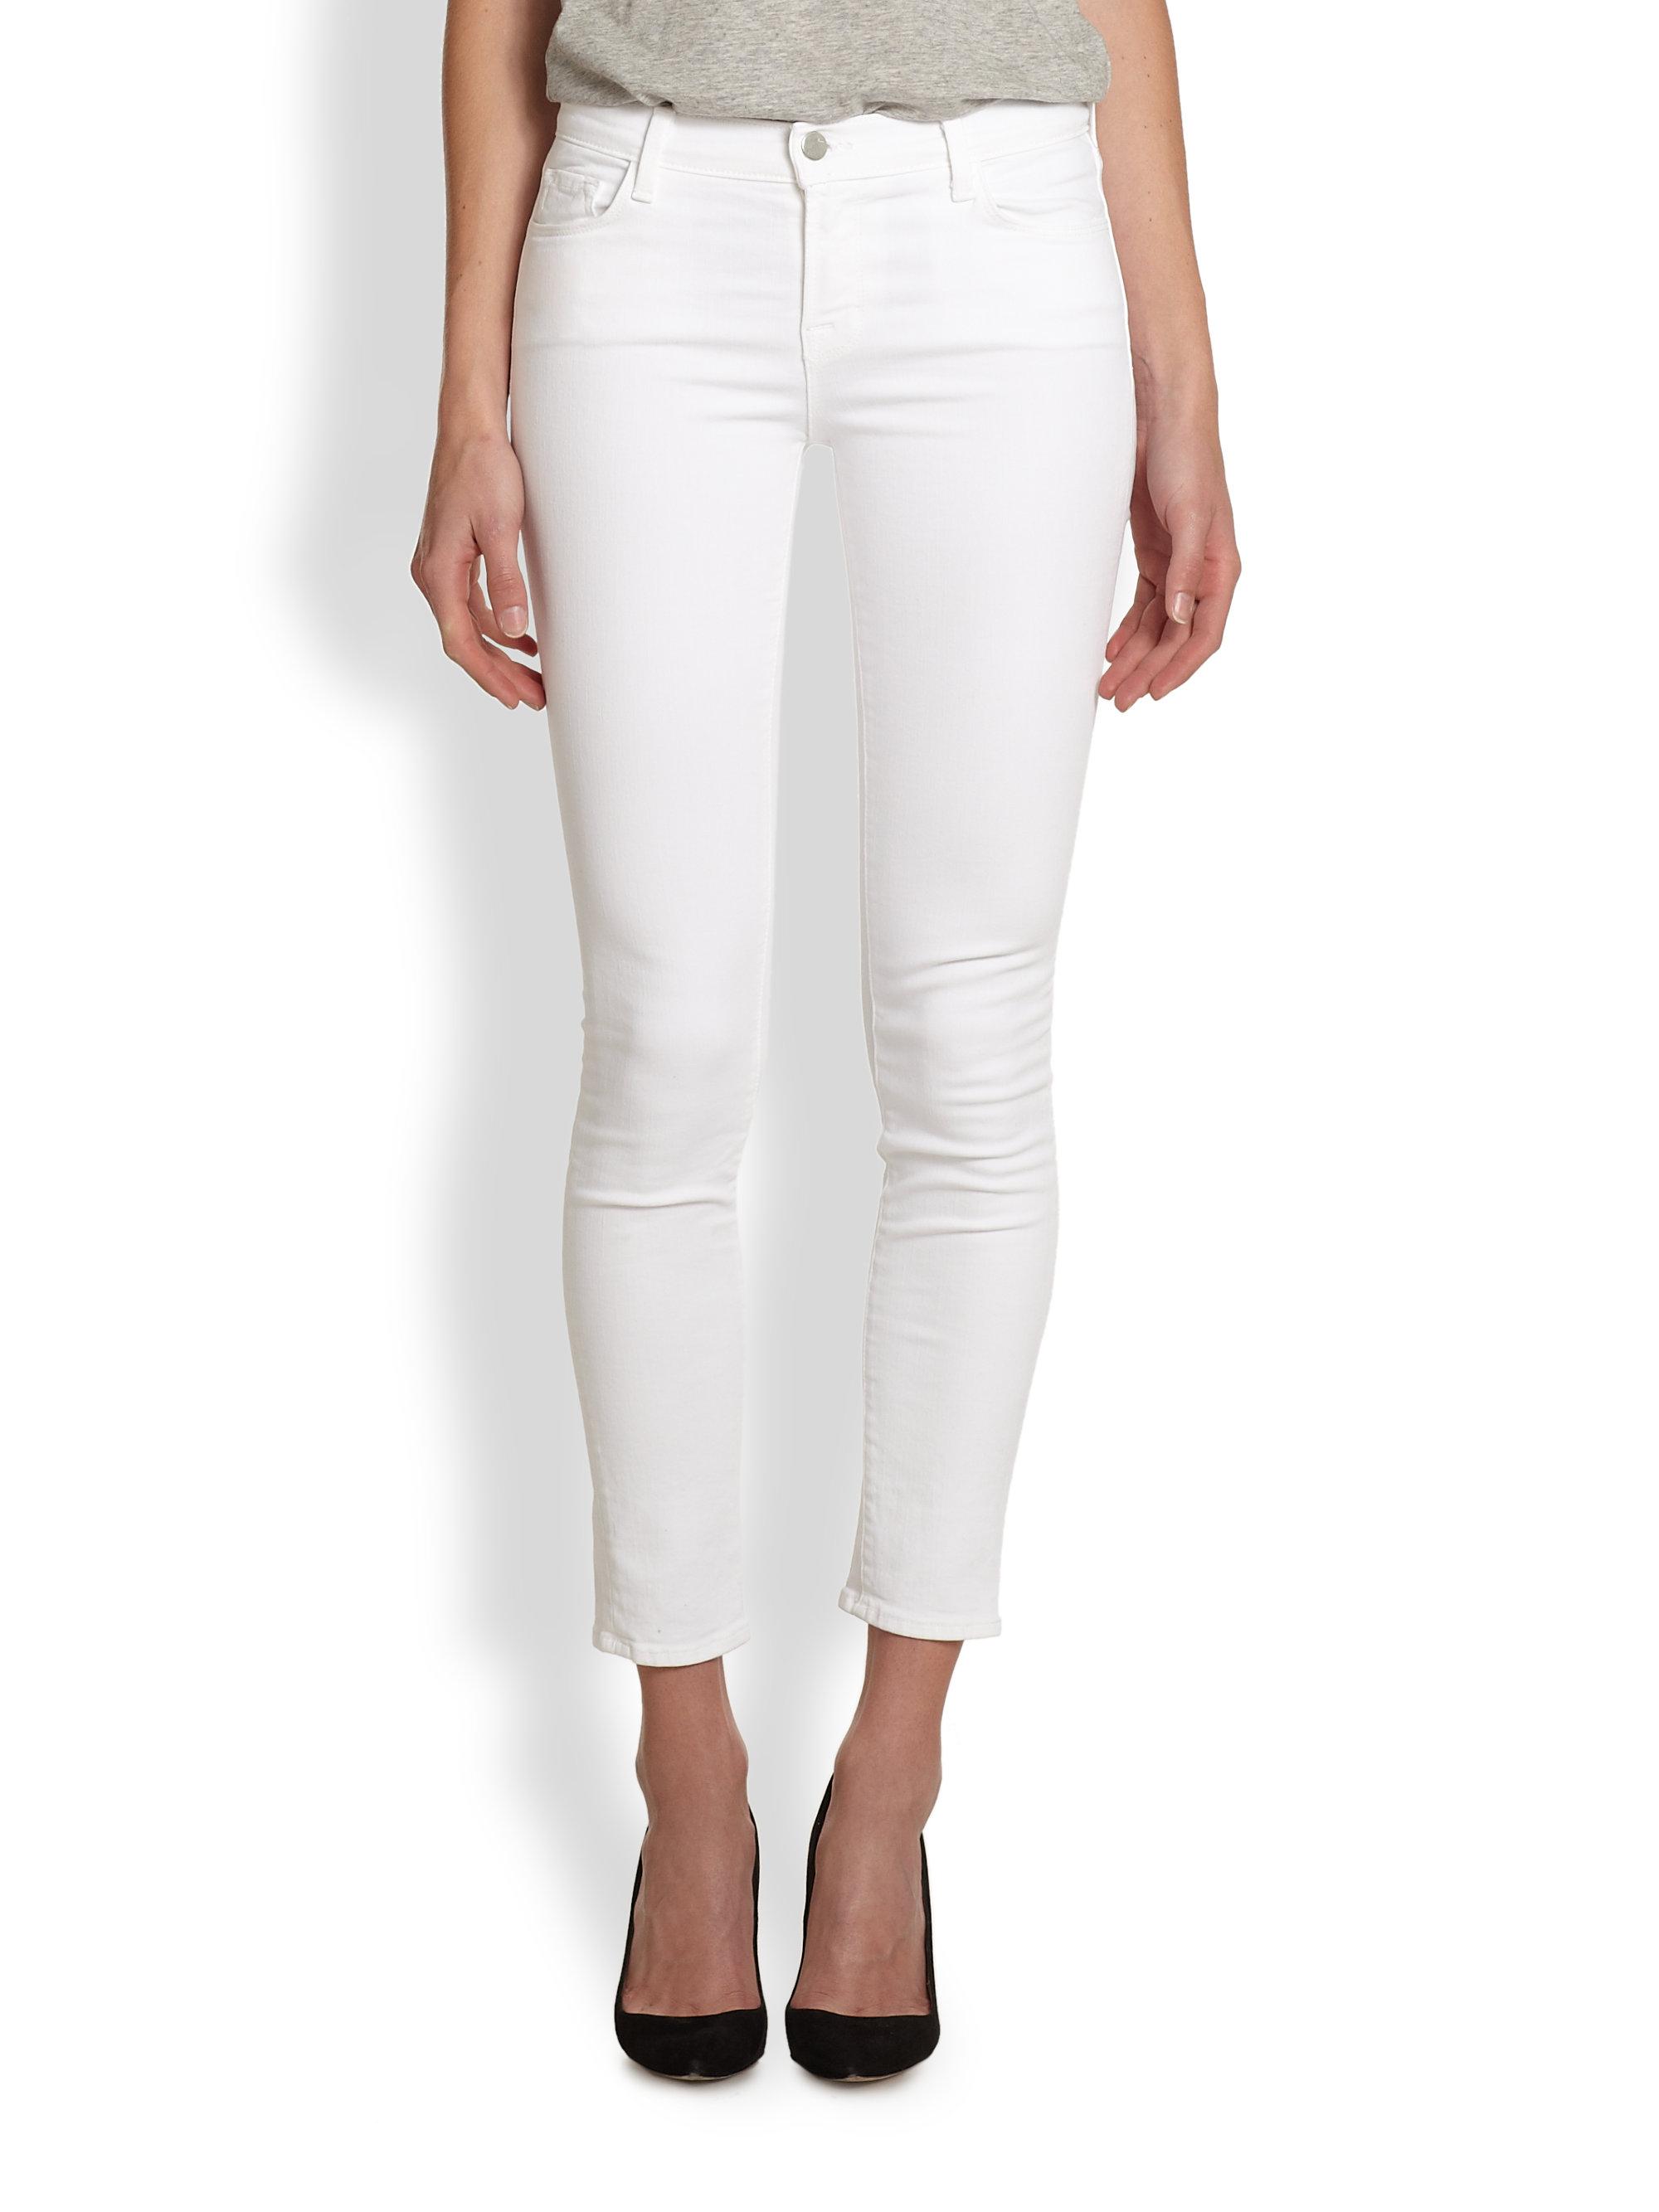 J brand 811 Midrise Skinny Jeans in White | Lyst